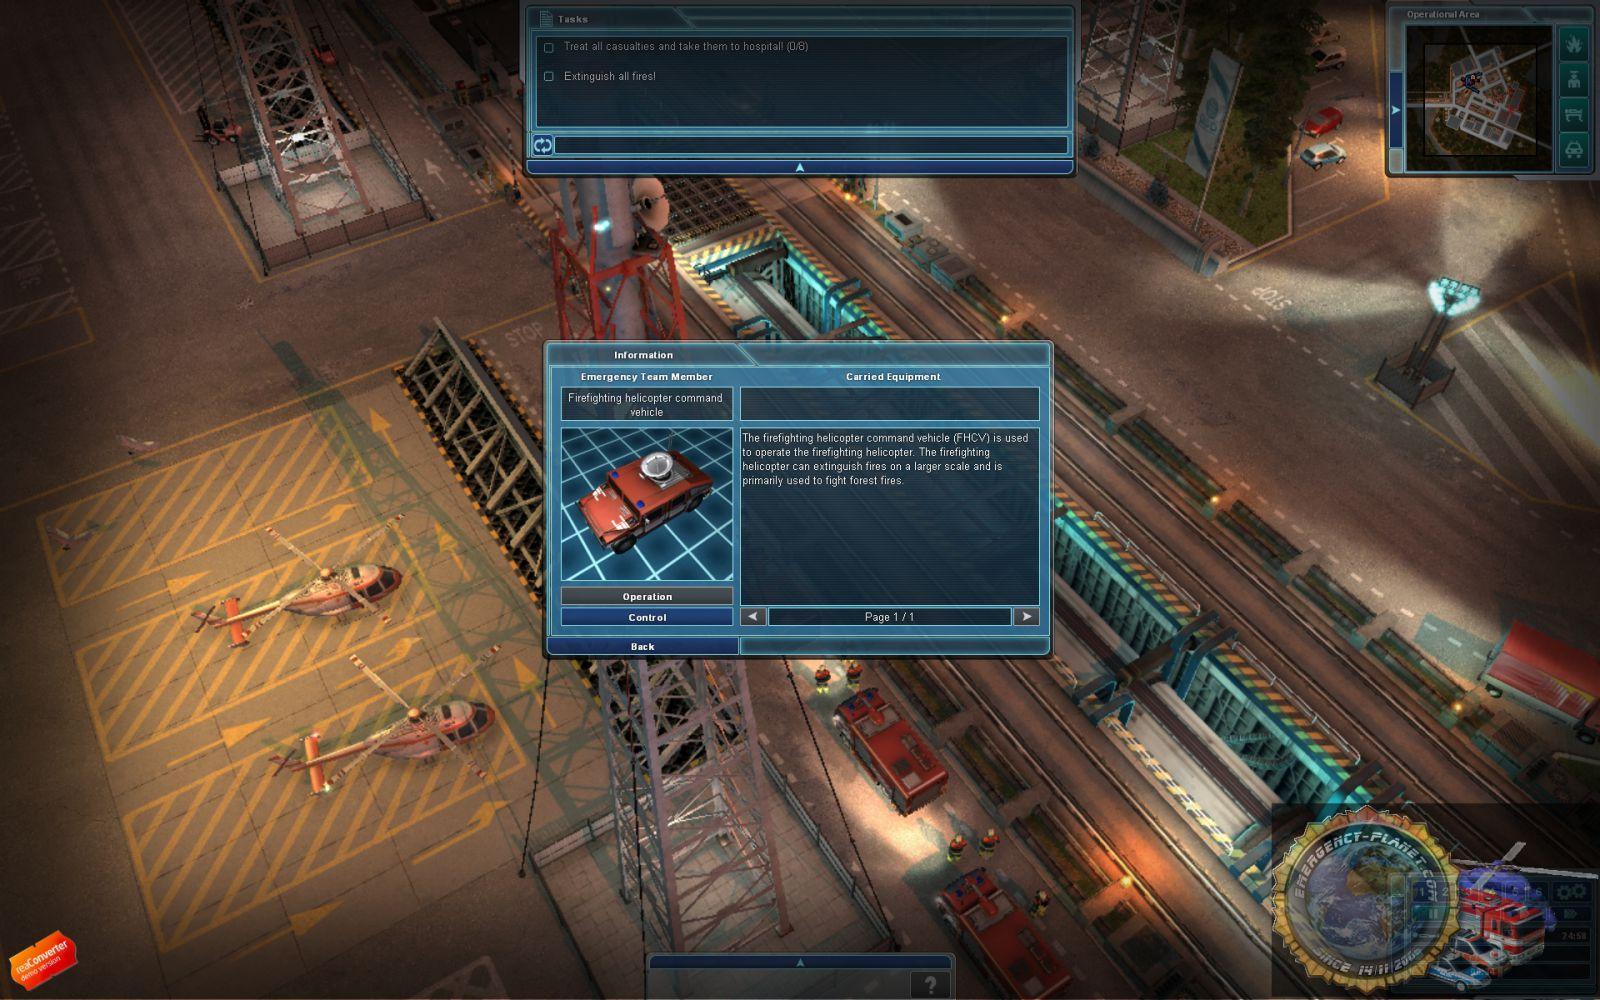 Emergency 2014 Screenshot 28